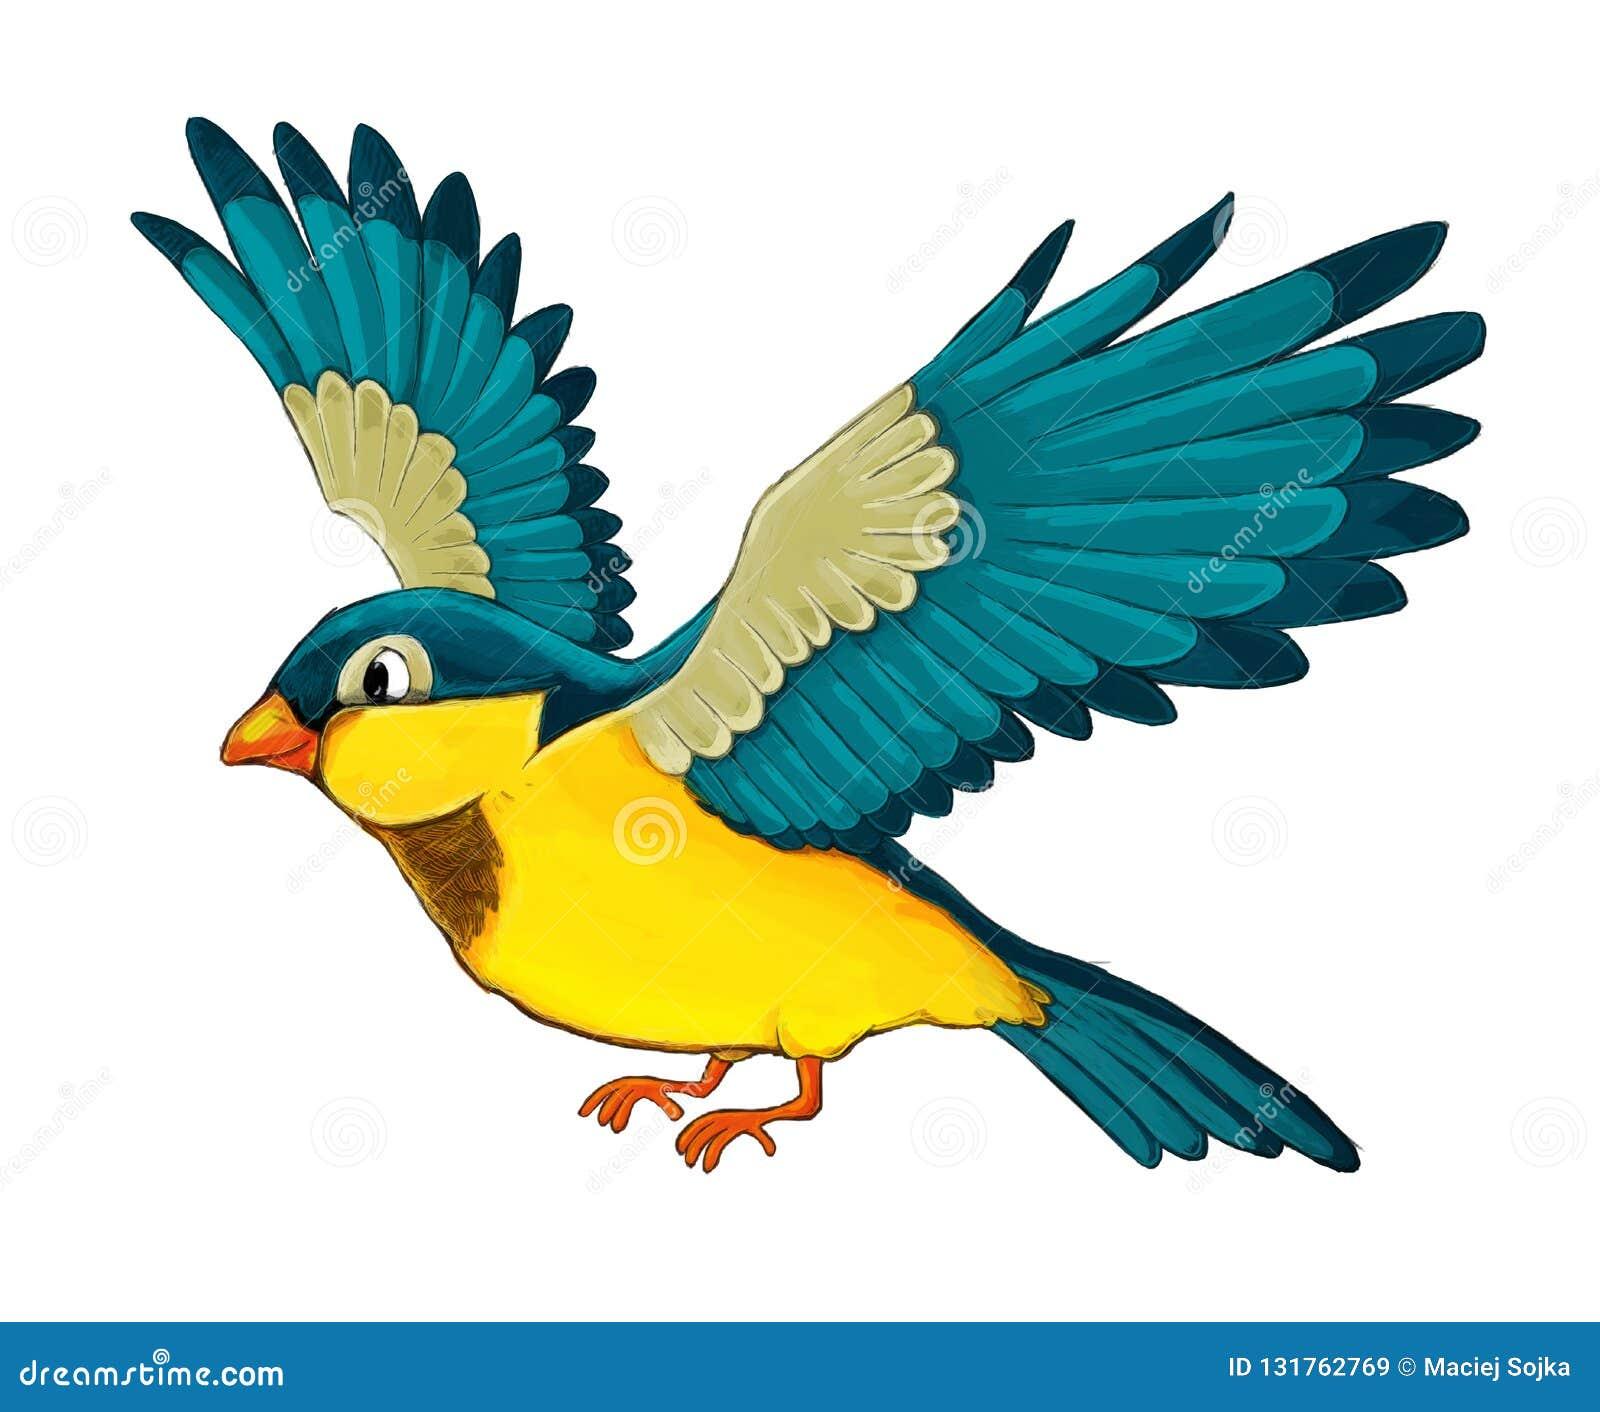 Passaro Colorido Exotico Dos Desenhos Animados Voando No Fundo